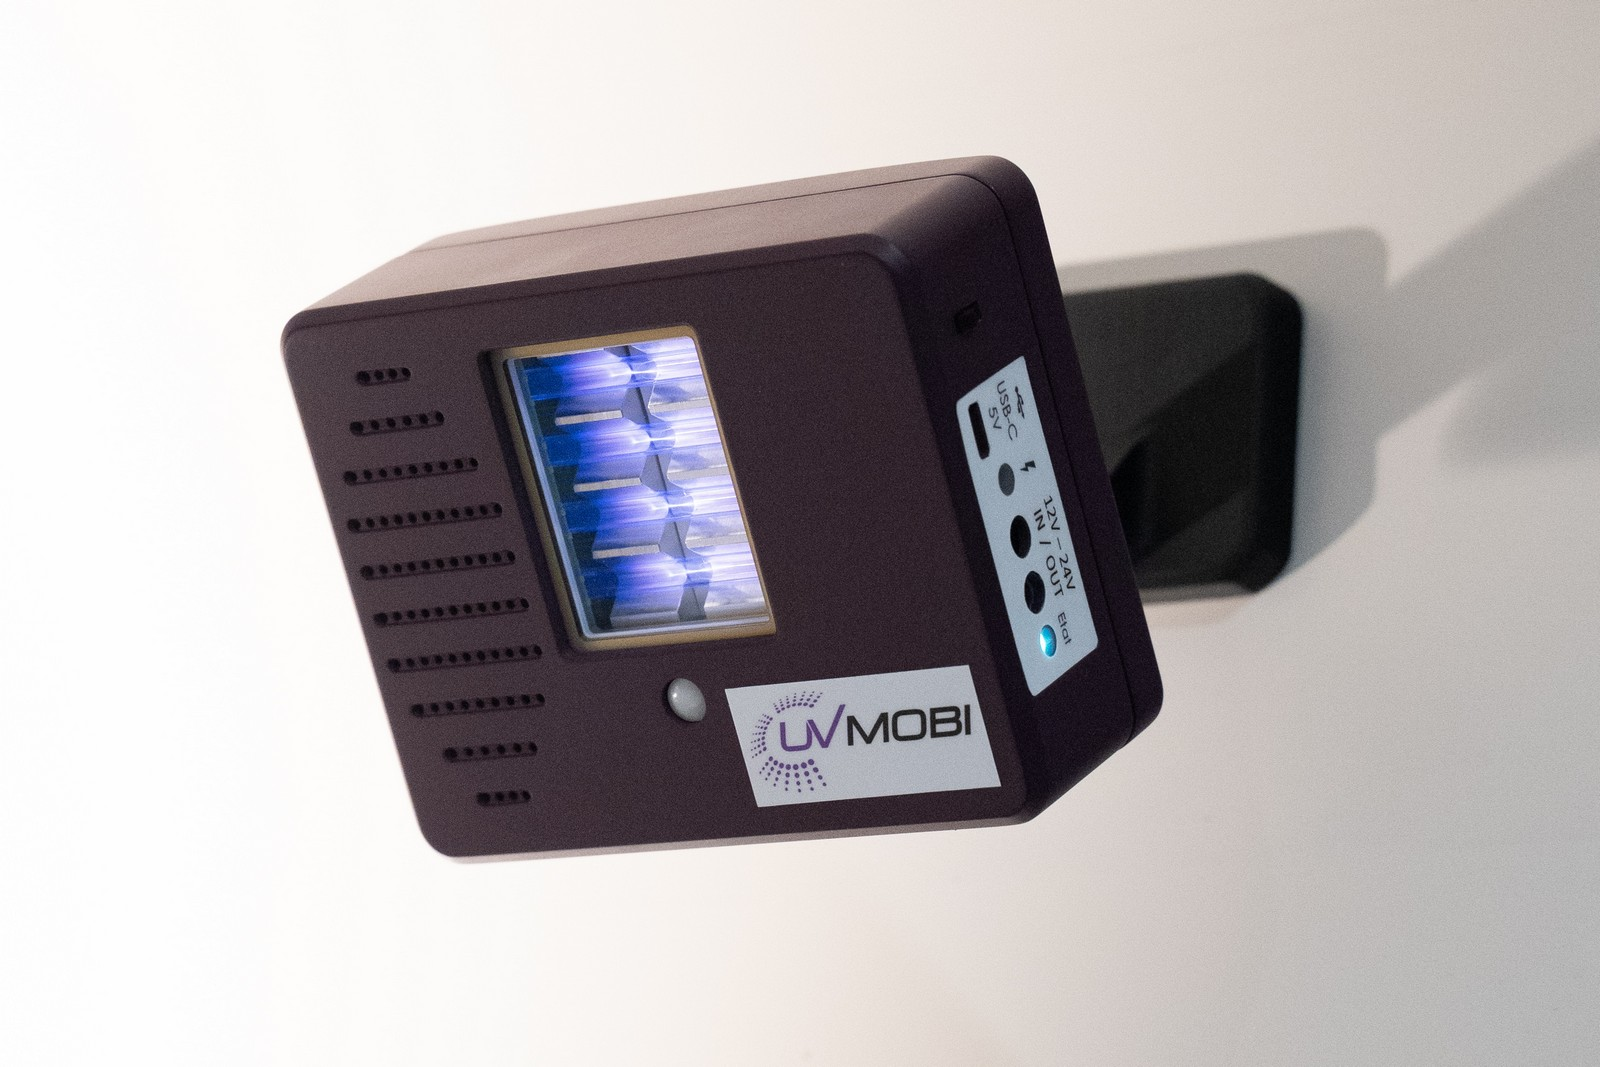 UV Mobi